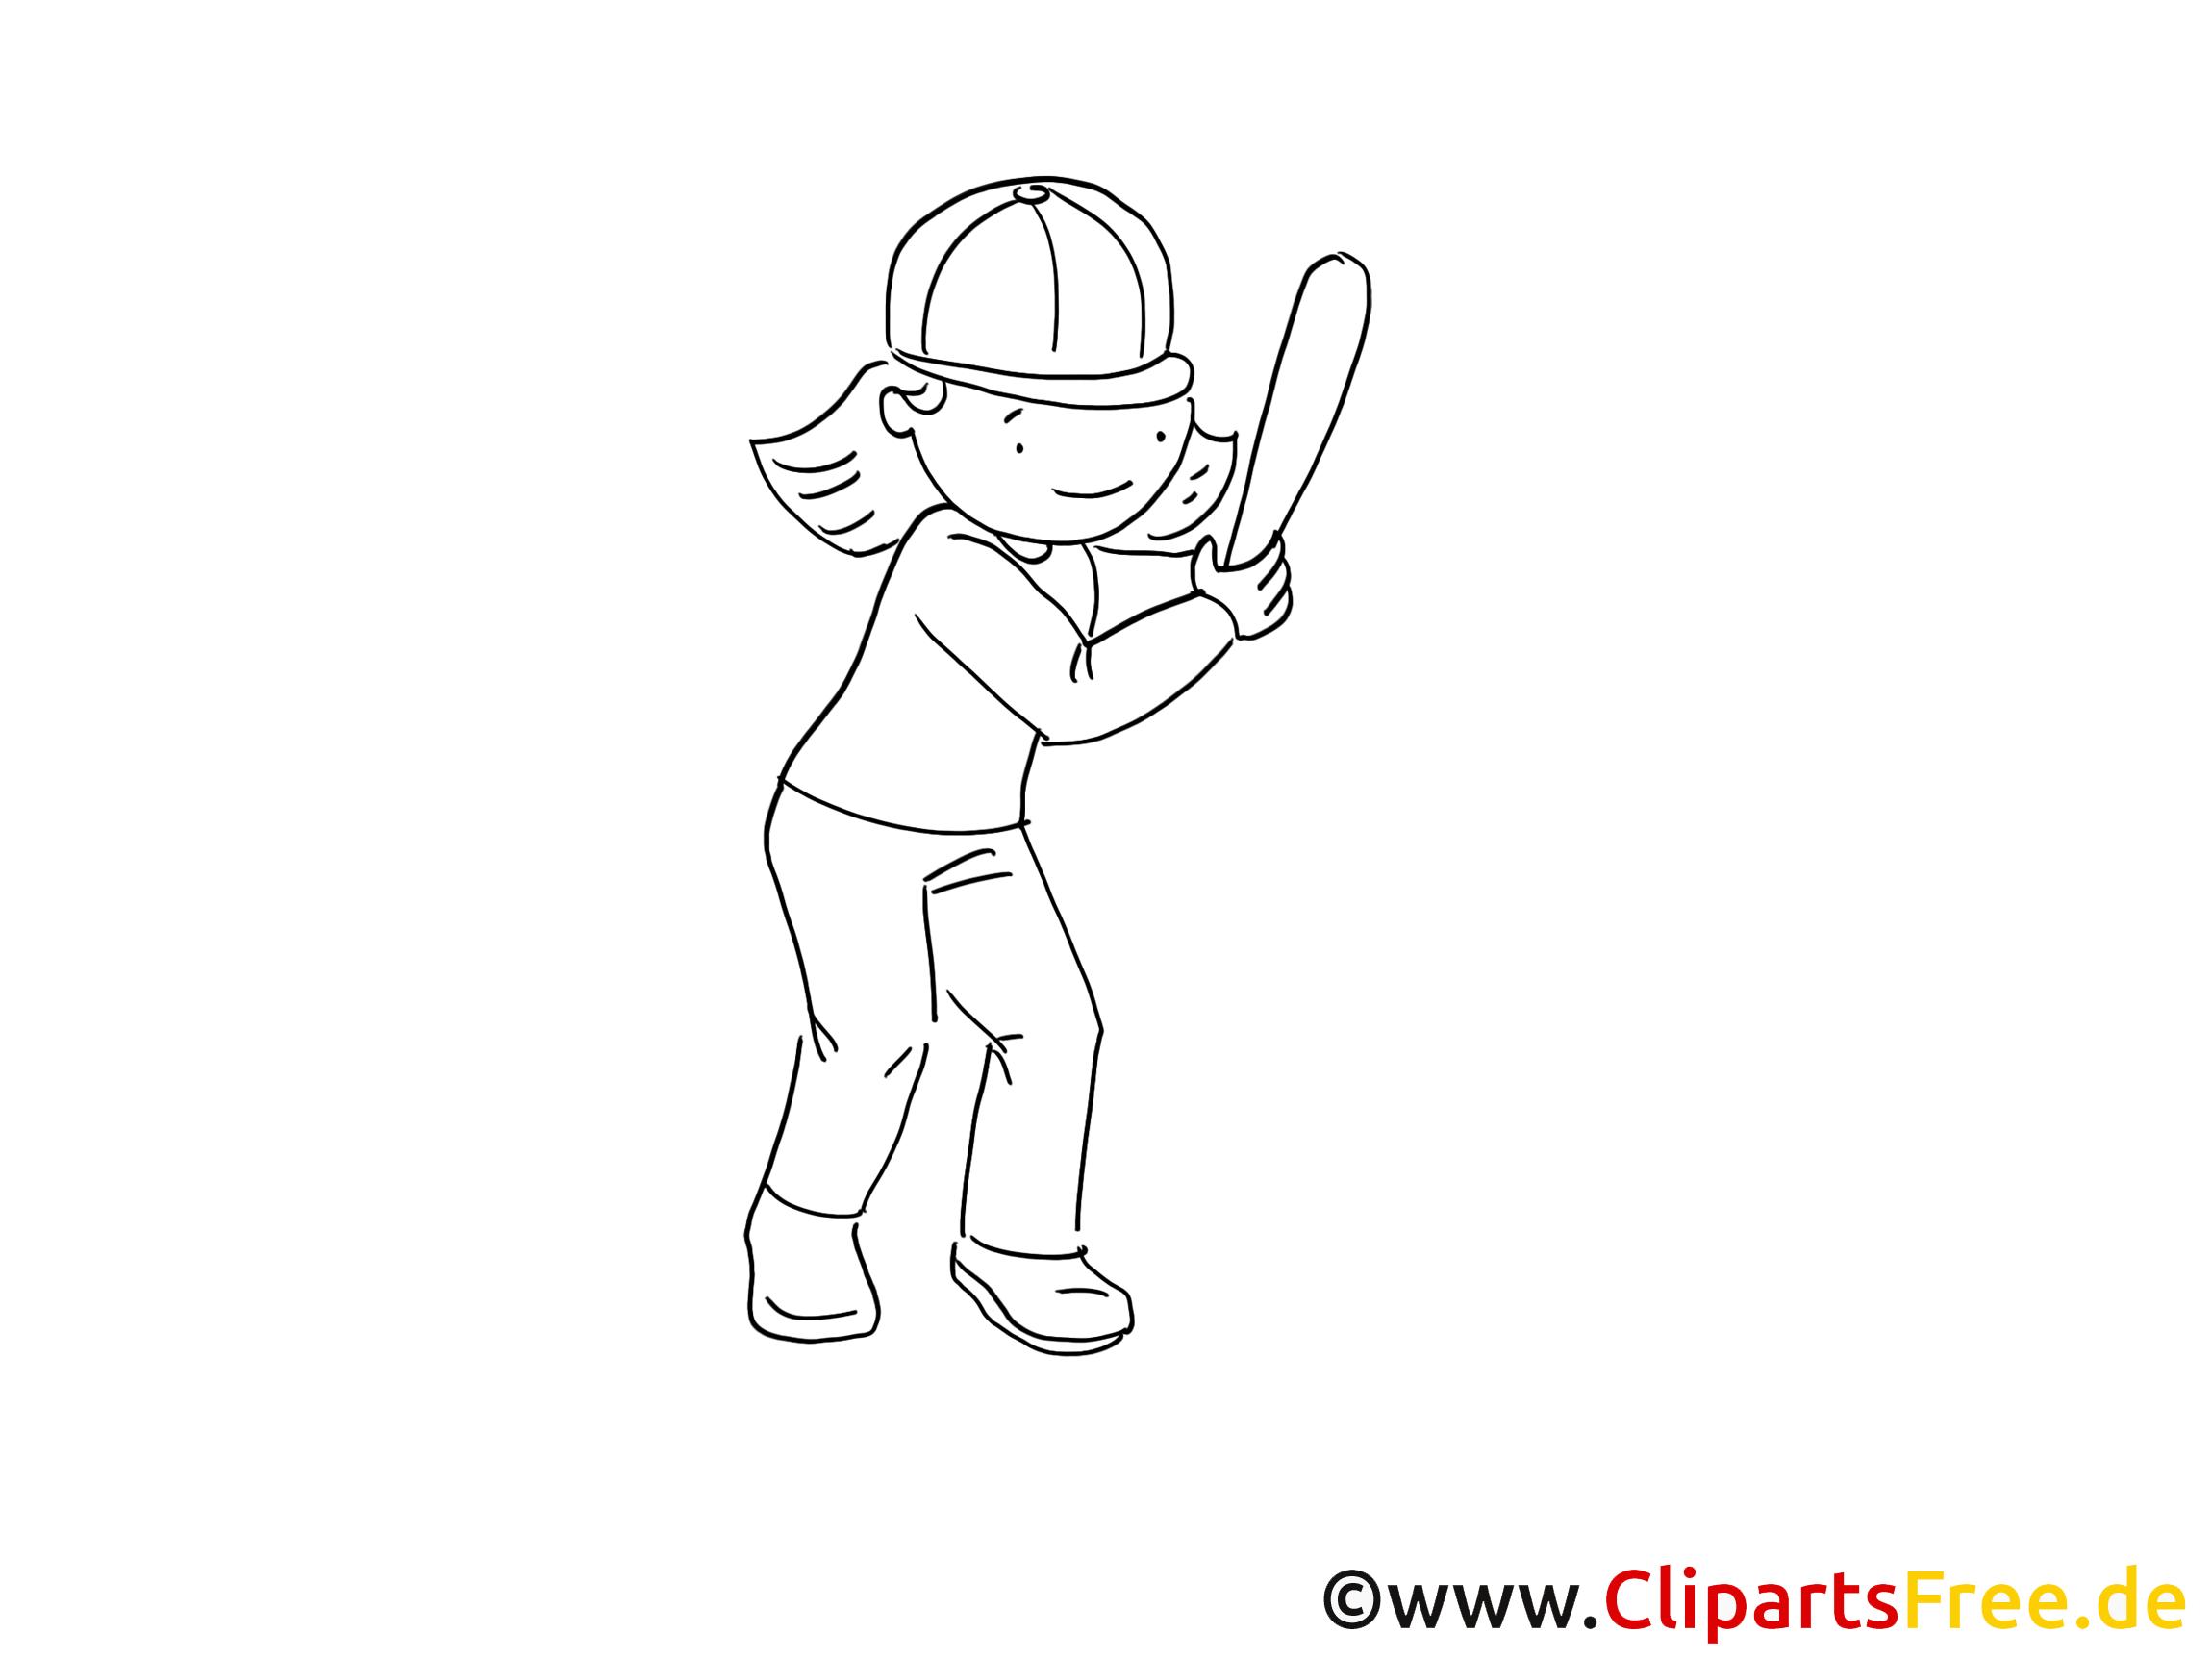 Base-ball dessin – Sport gratuits à imprimer